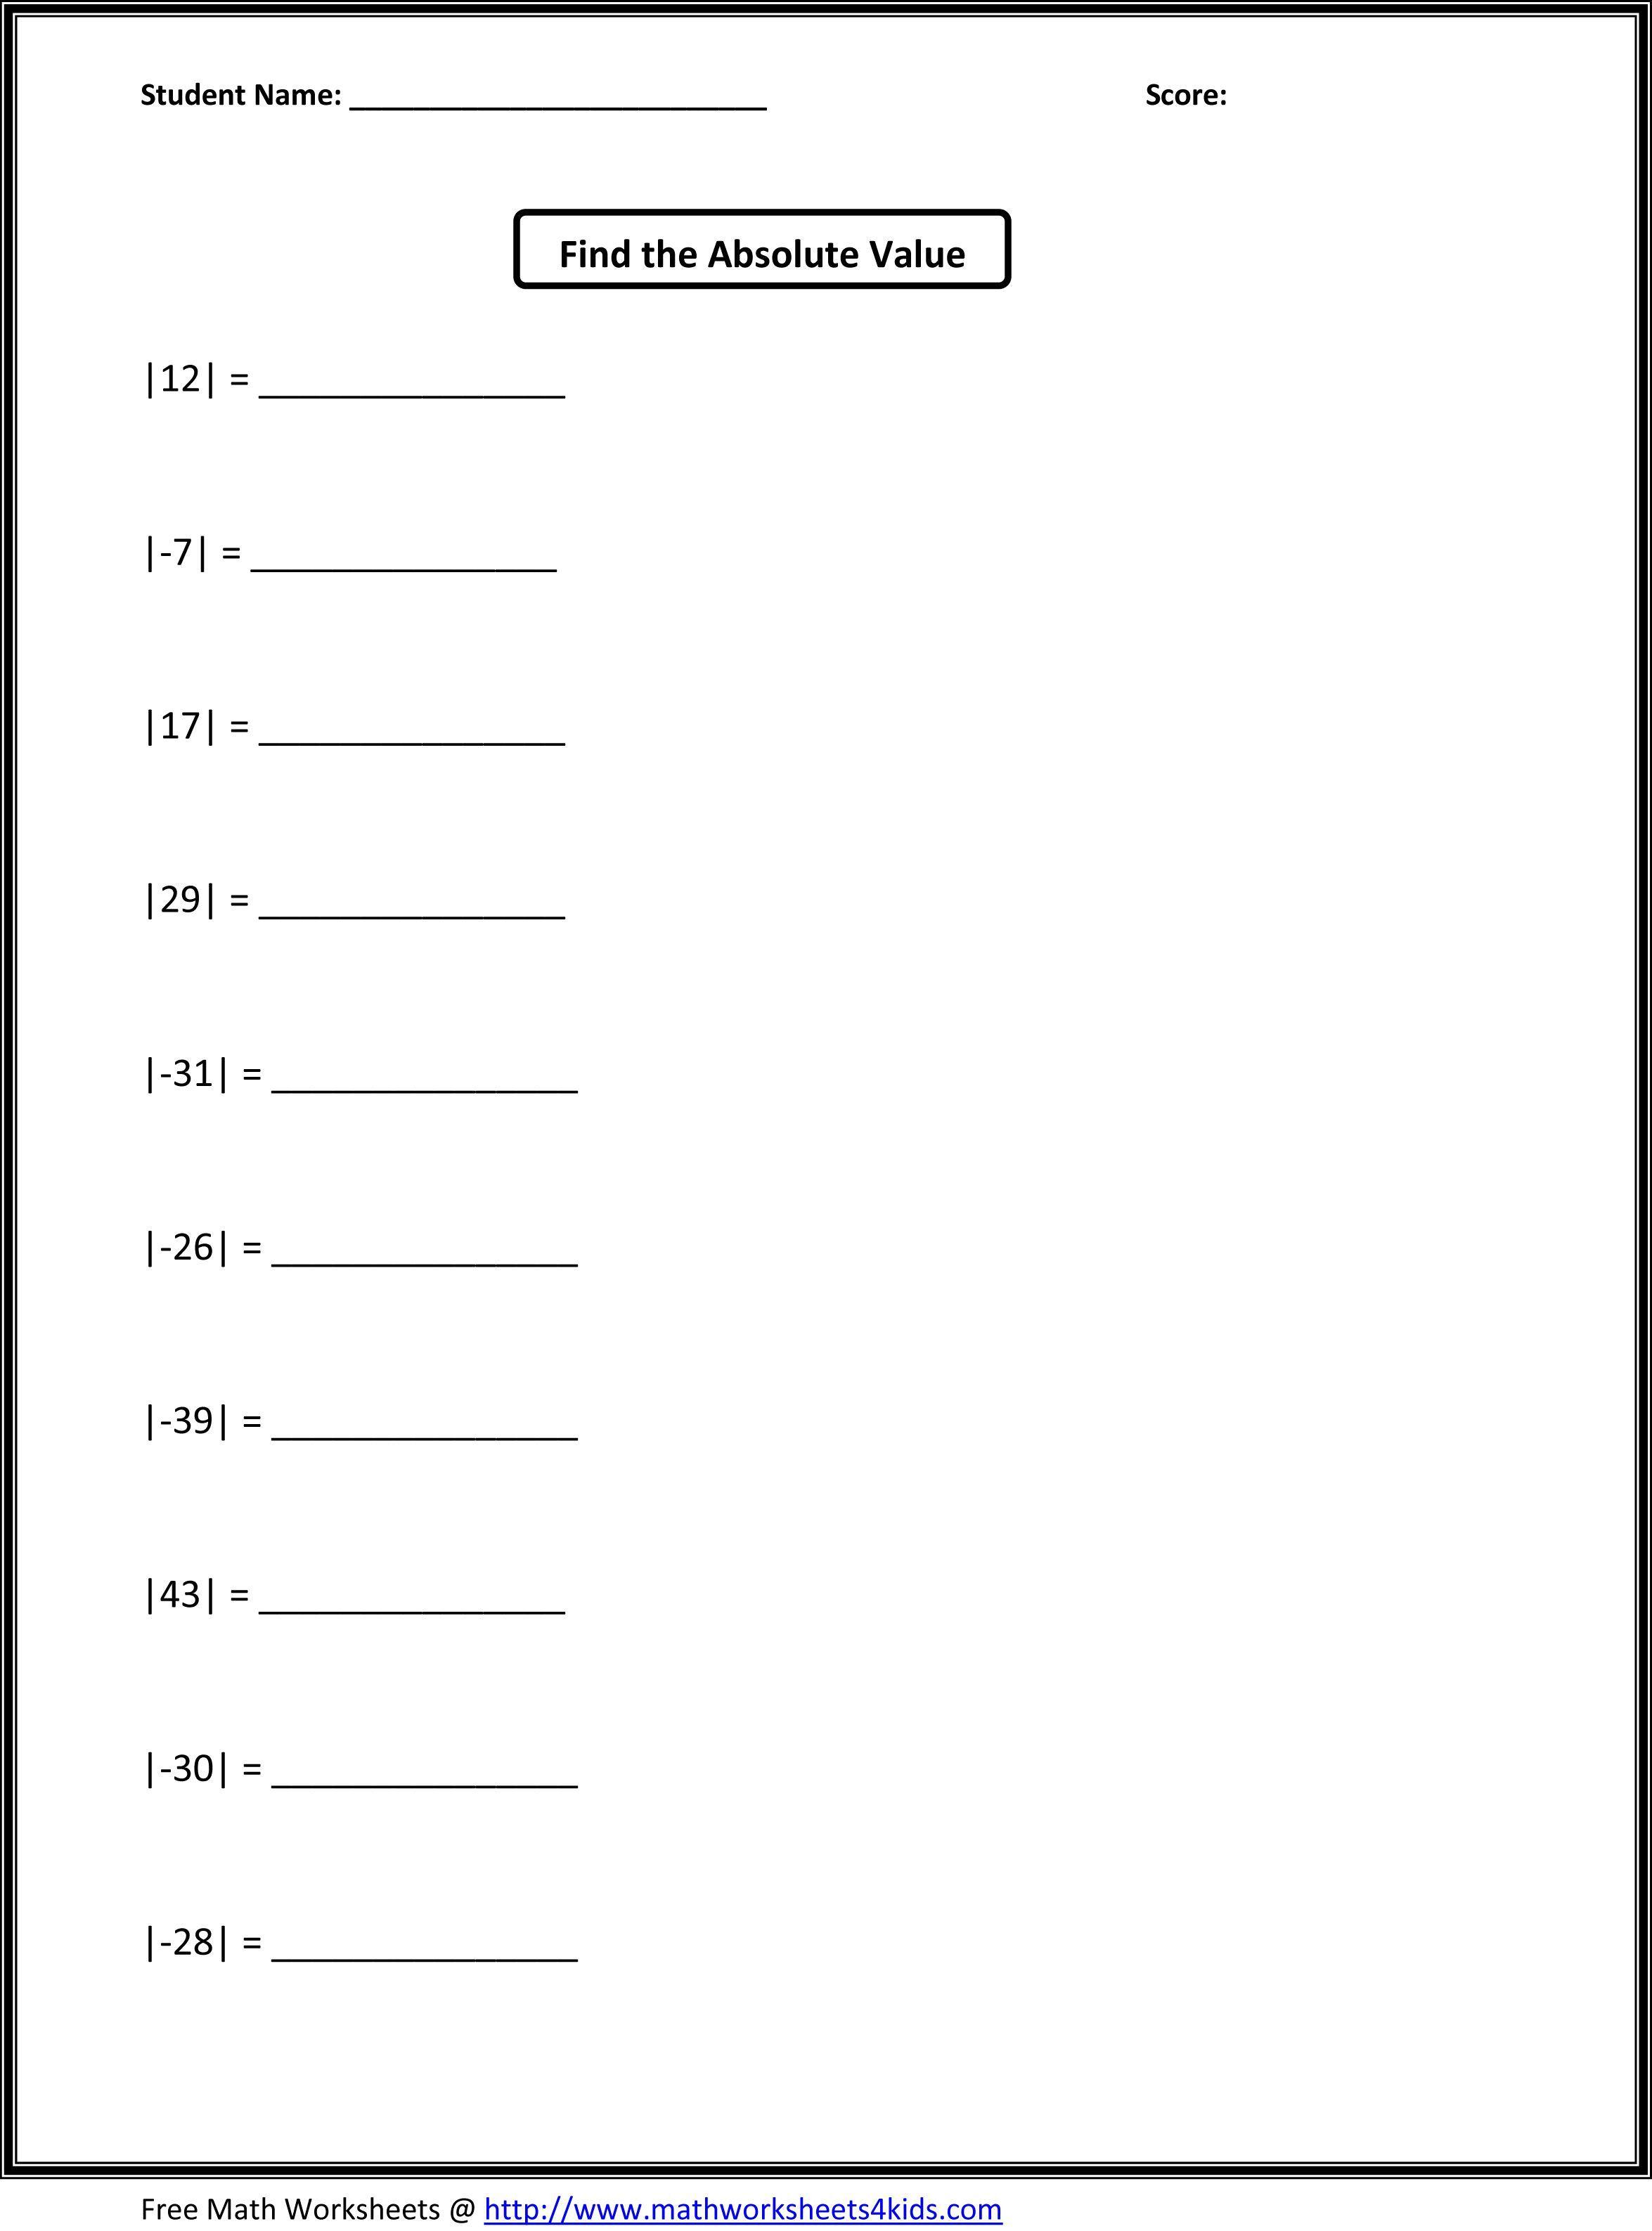 Fifth Grade Measurement Worksheets Fifth Grade Math Worksheets   Free math  worksheets [ 3174 x 2350 Pixel ]